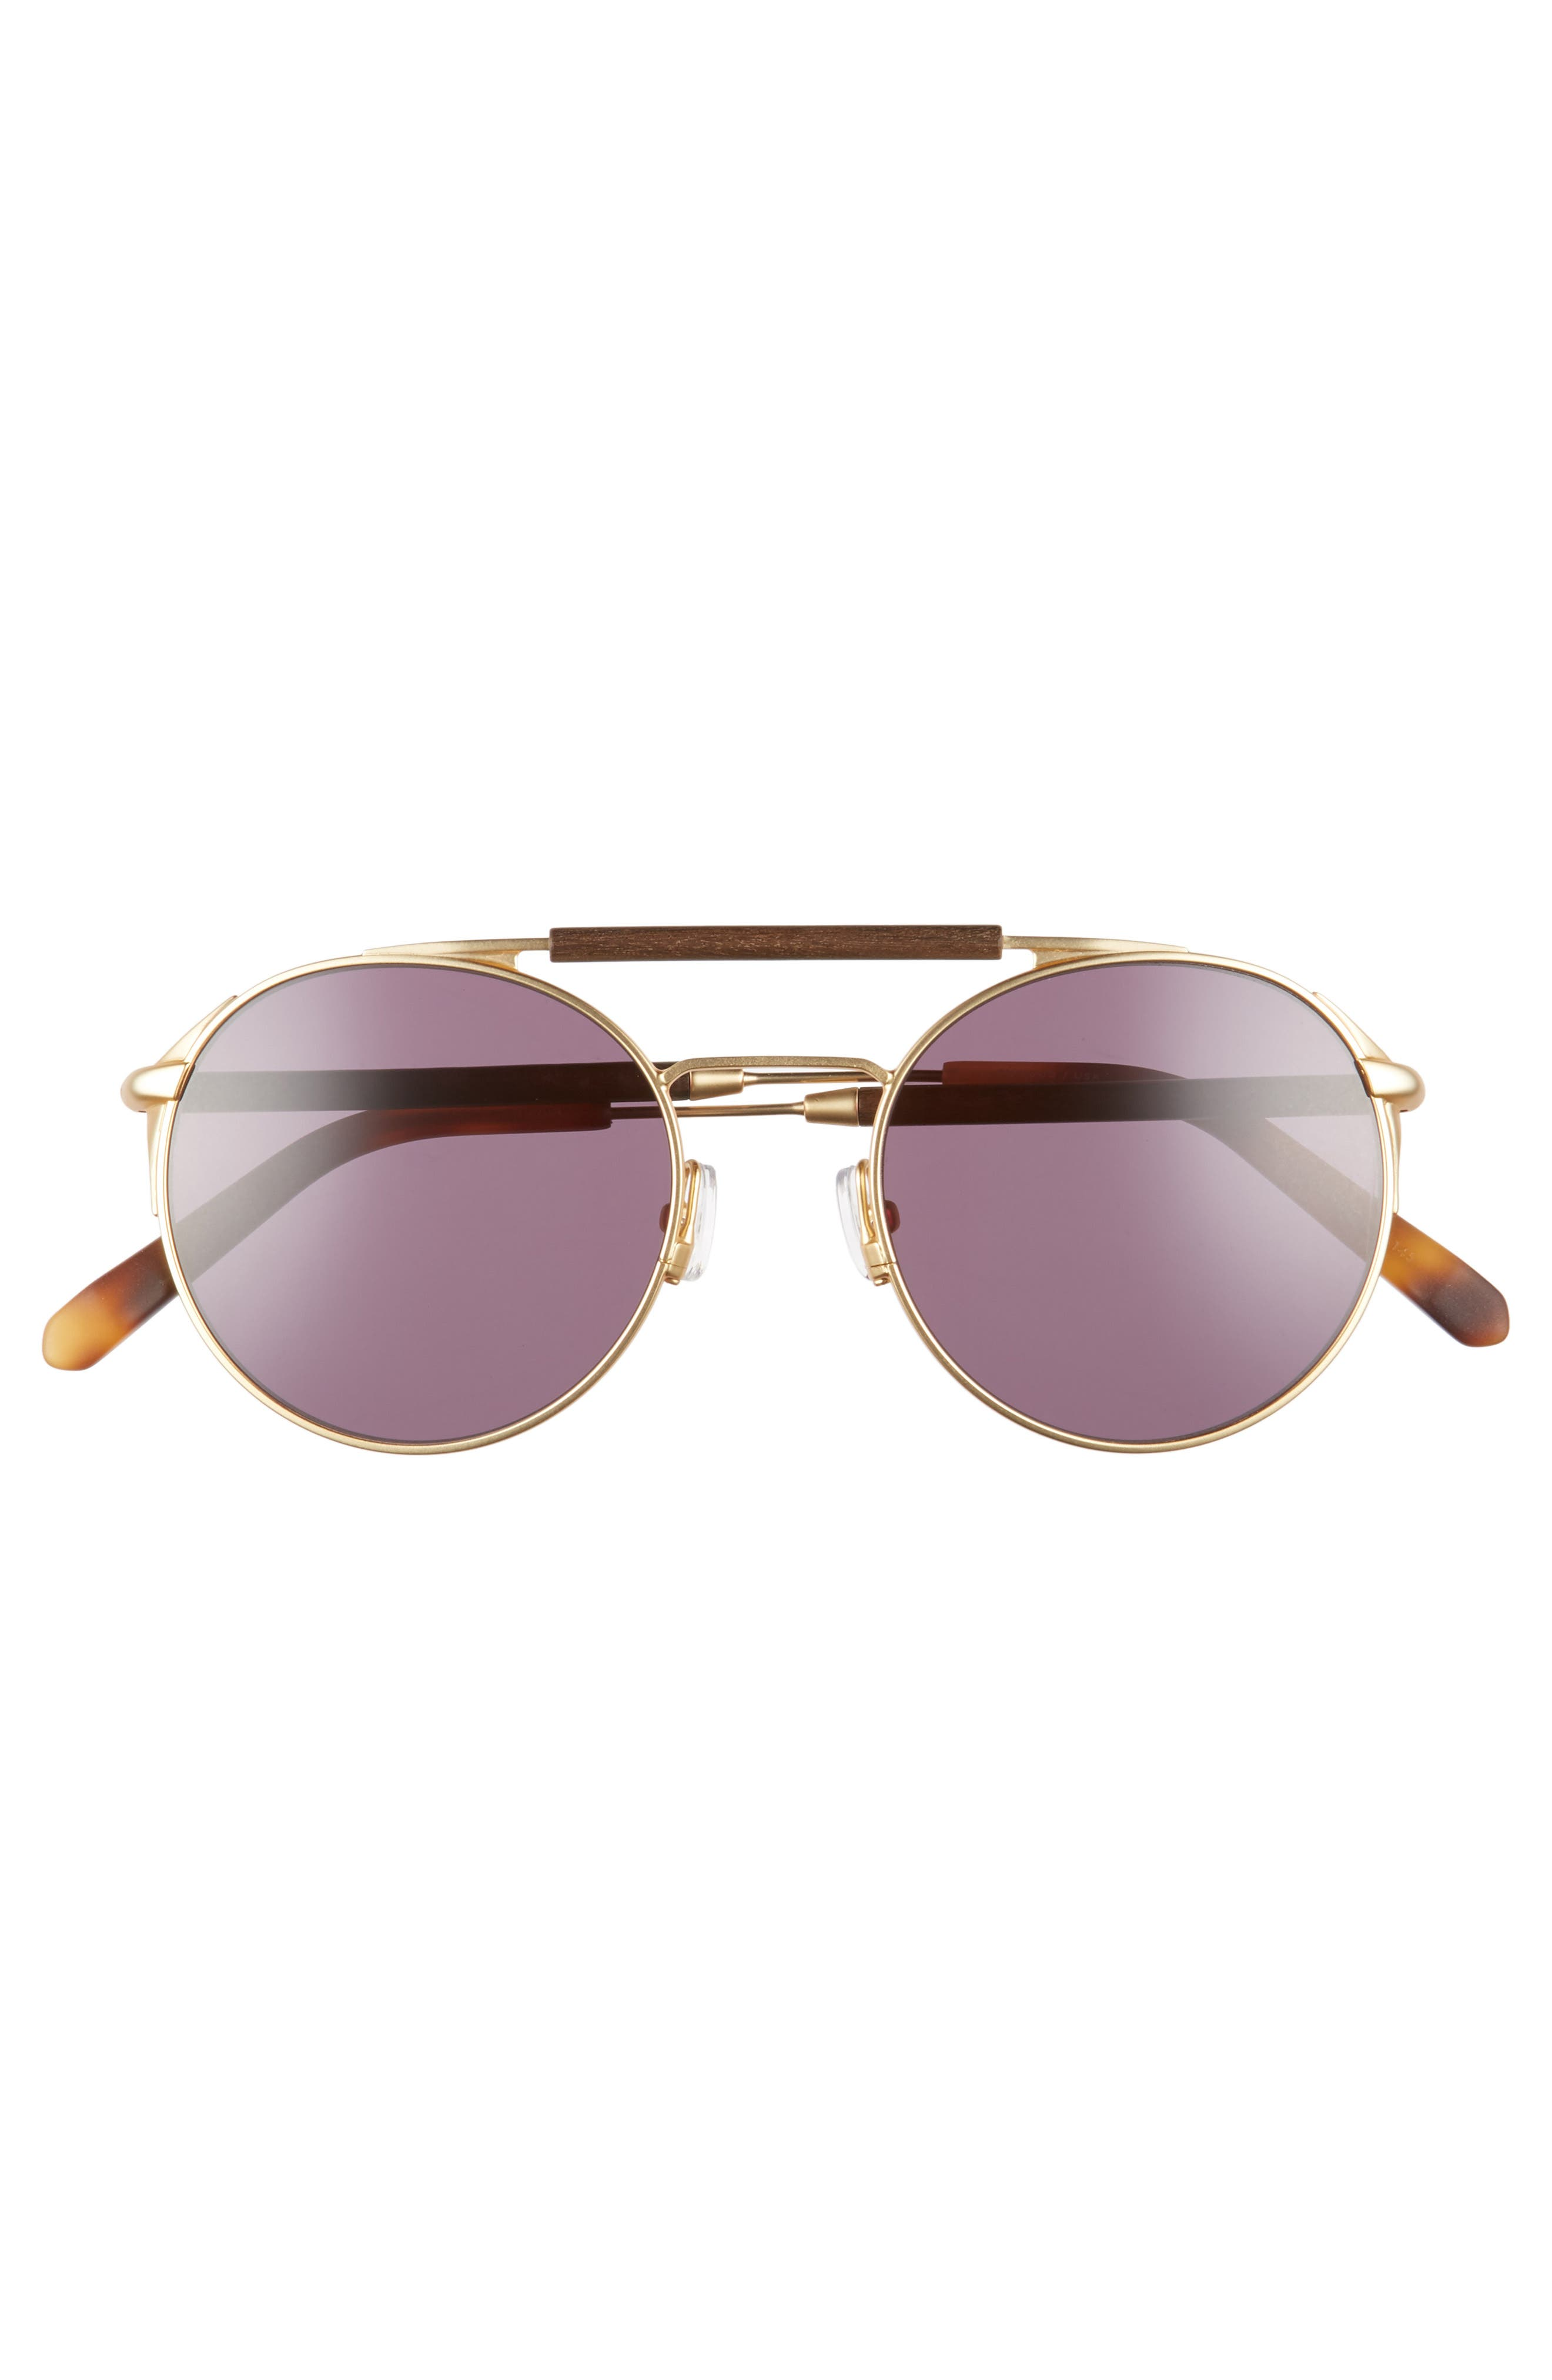 Bandon 52mm Round Sunglasses,                             Alternate thumbnail 7, color,